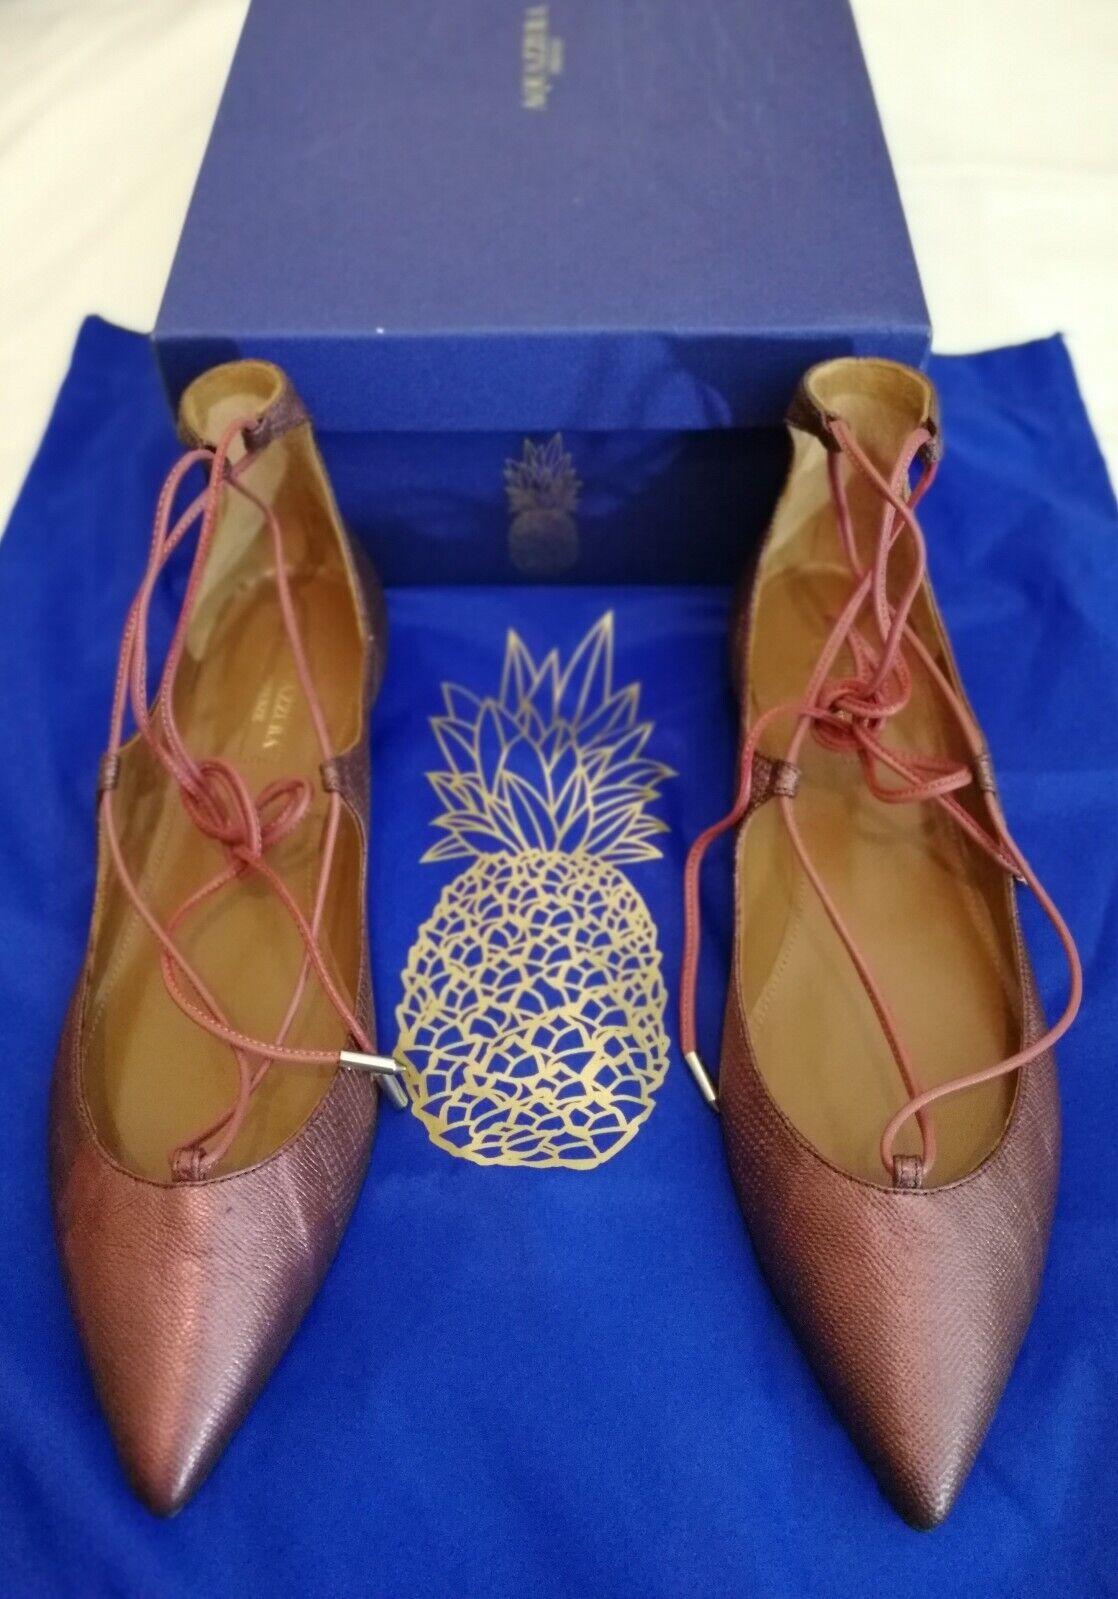 Aquazzura Firenze Christy Flat Karung Leather Größe uk 5.5, eu 38.5 New